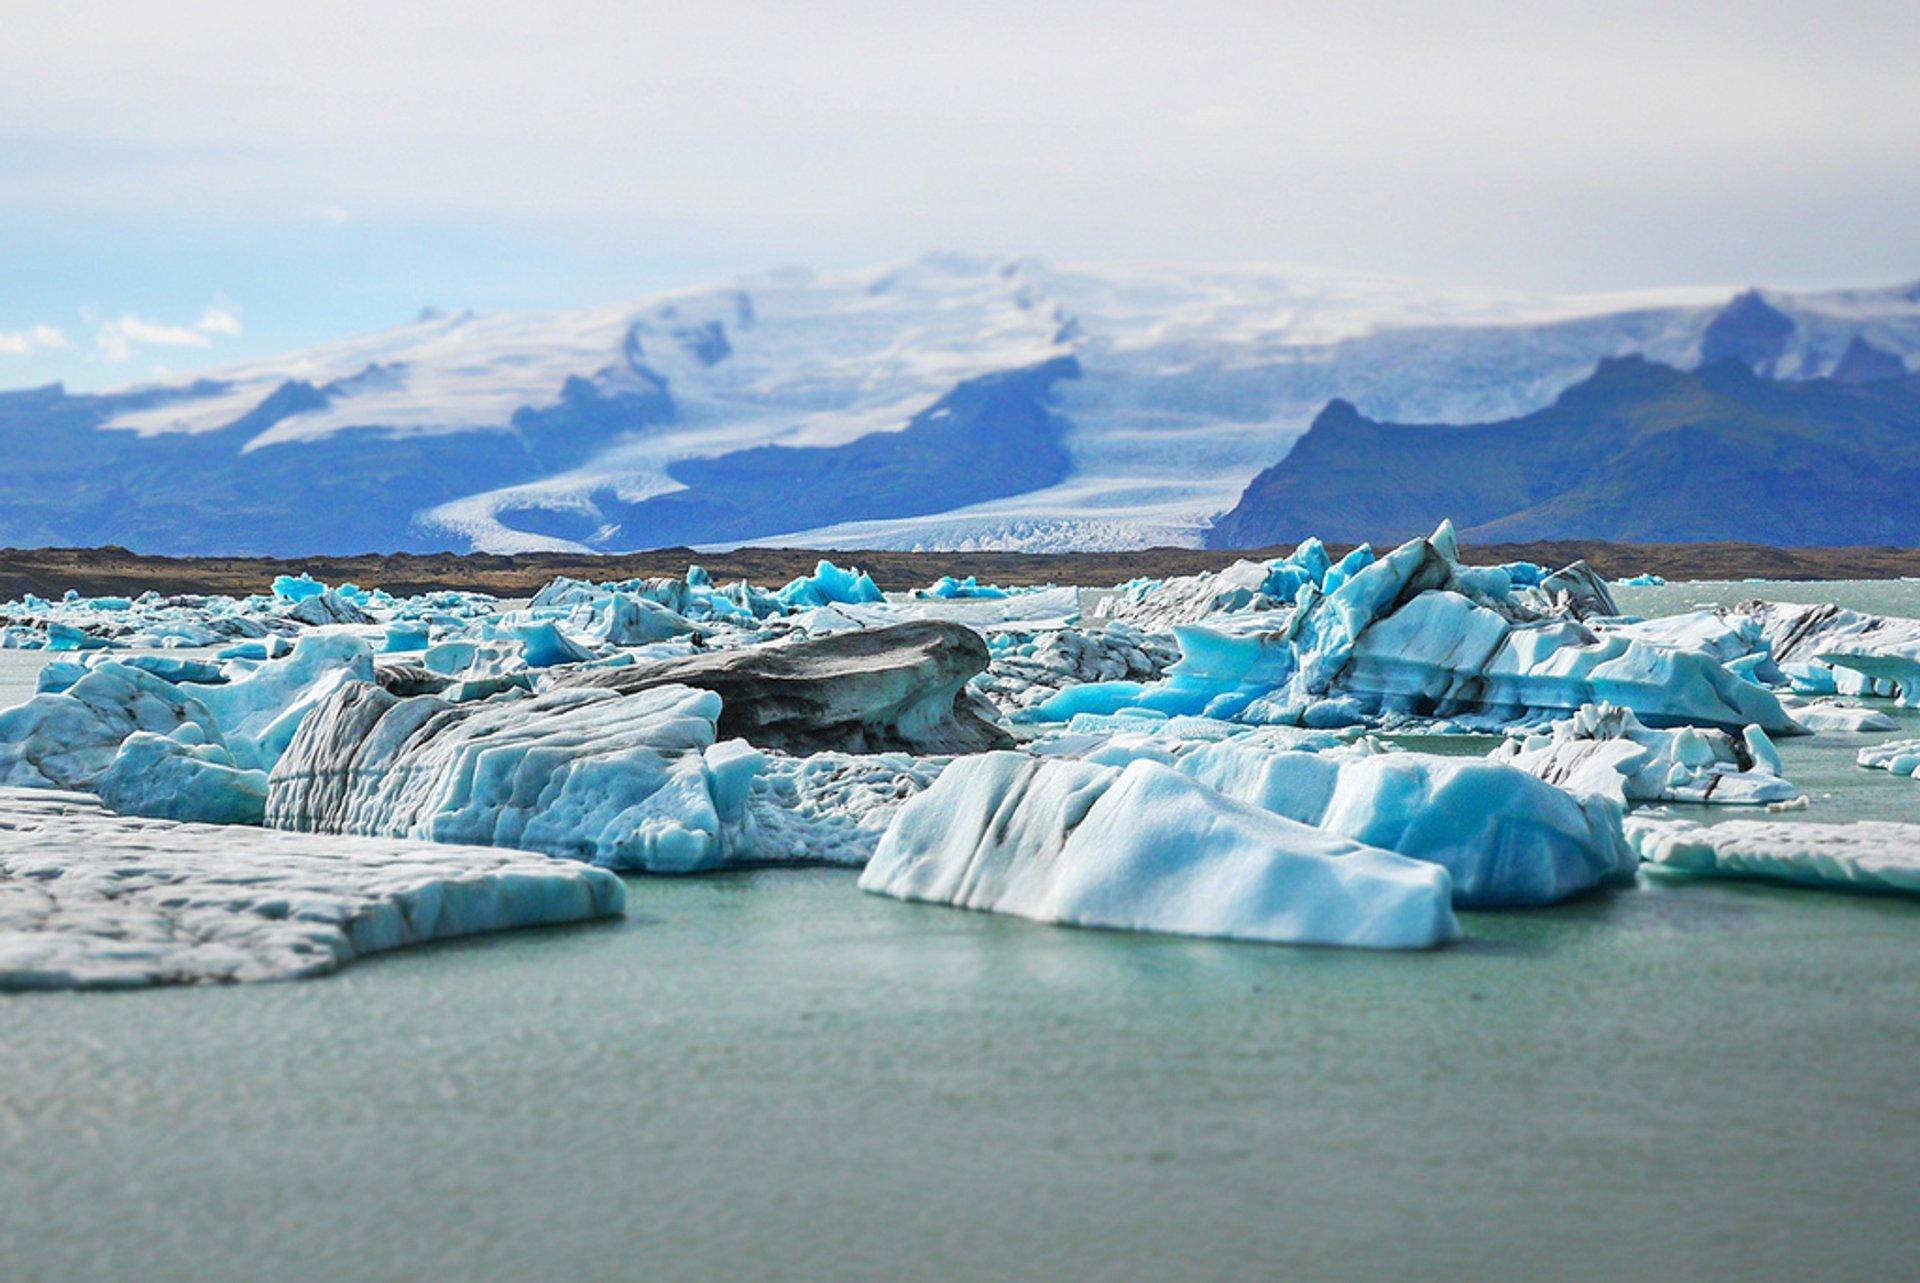 Jökulsárlón Glacier Lagoon in Iceland 2020 - Best Time